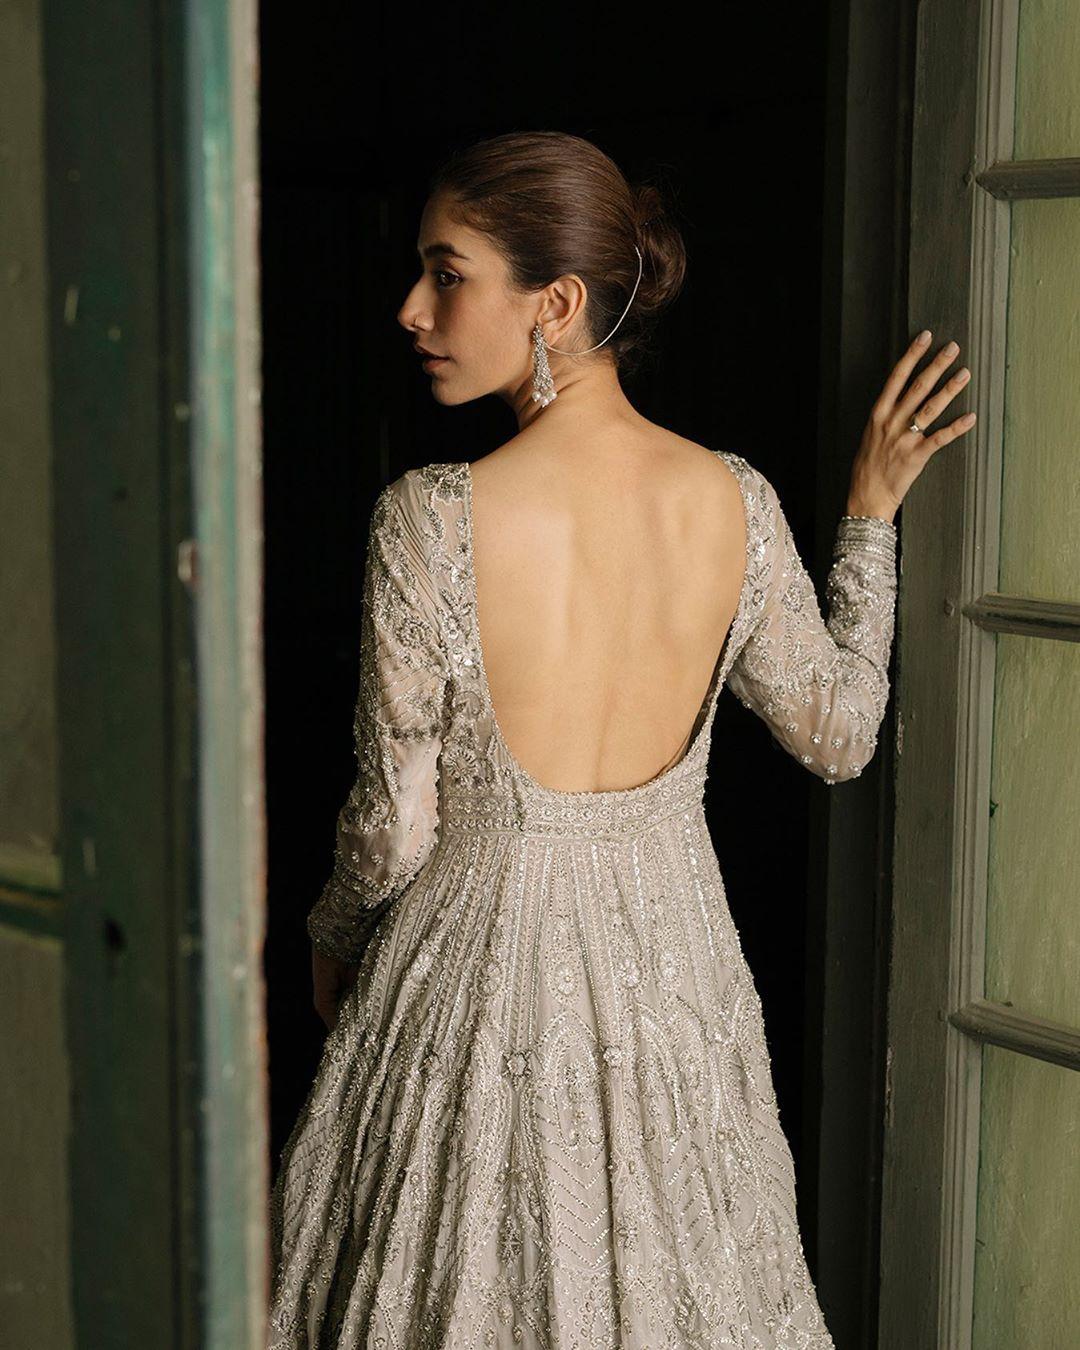 Beautiful Clicks of Syra Shehroz in New Bridal Shoot